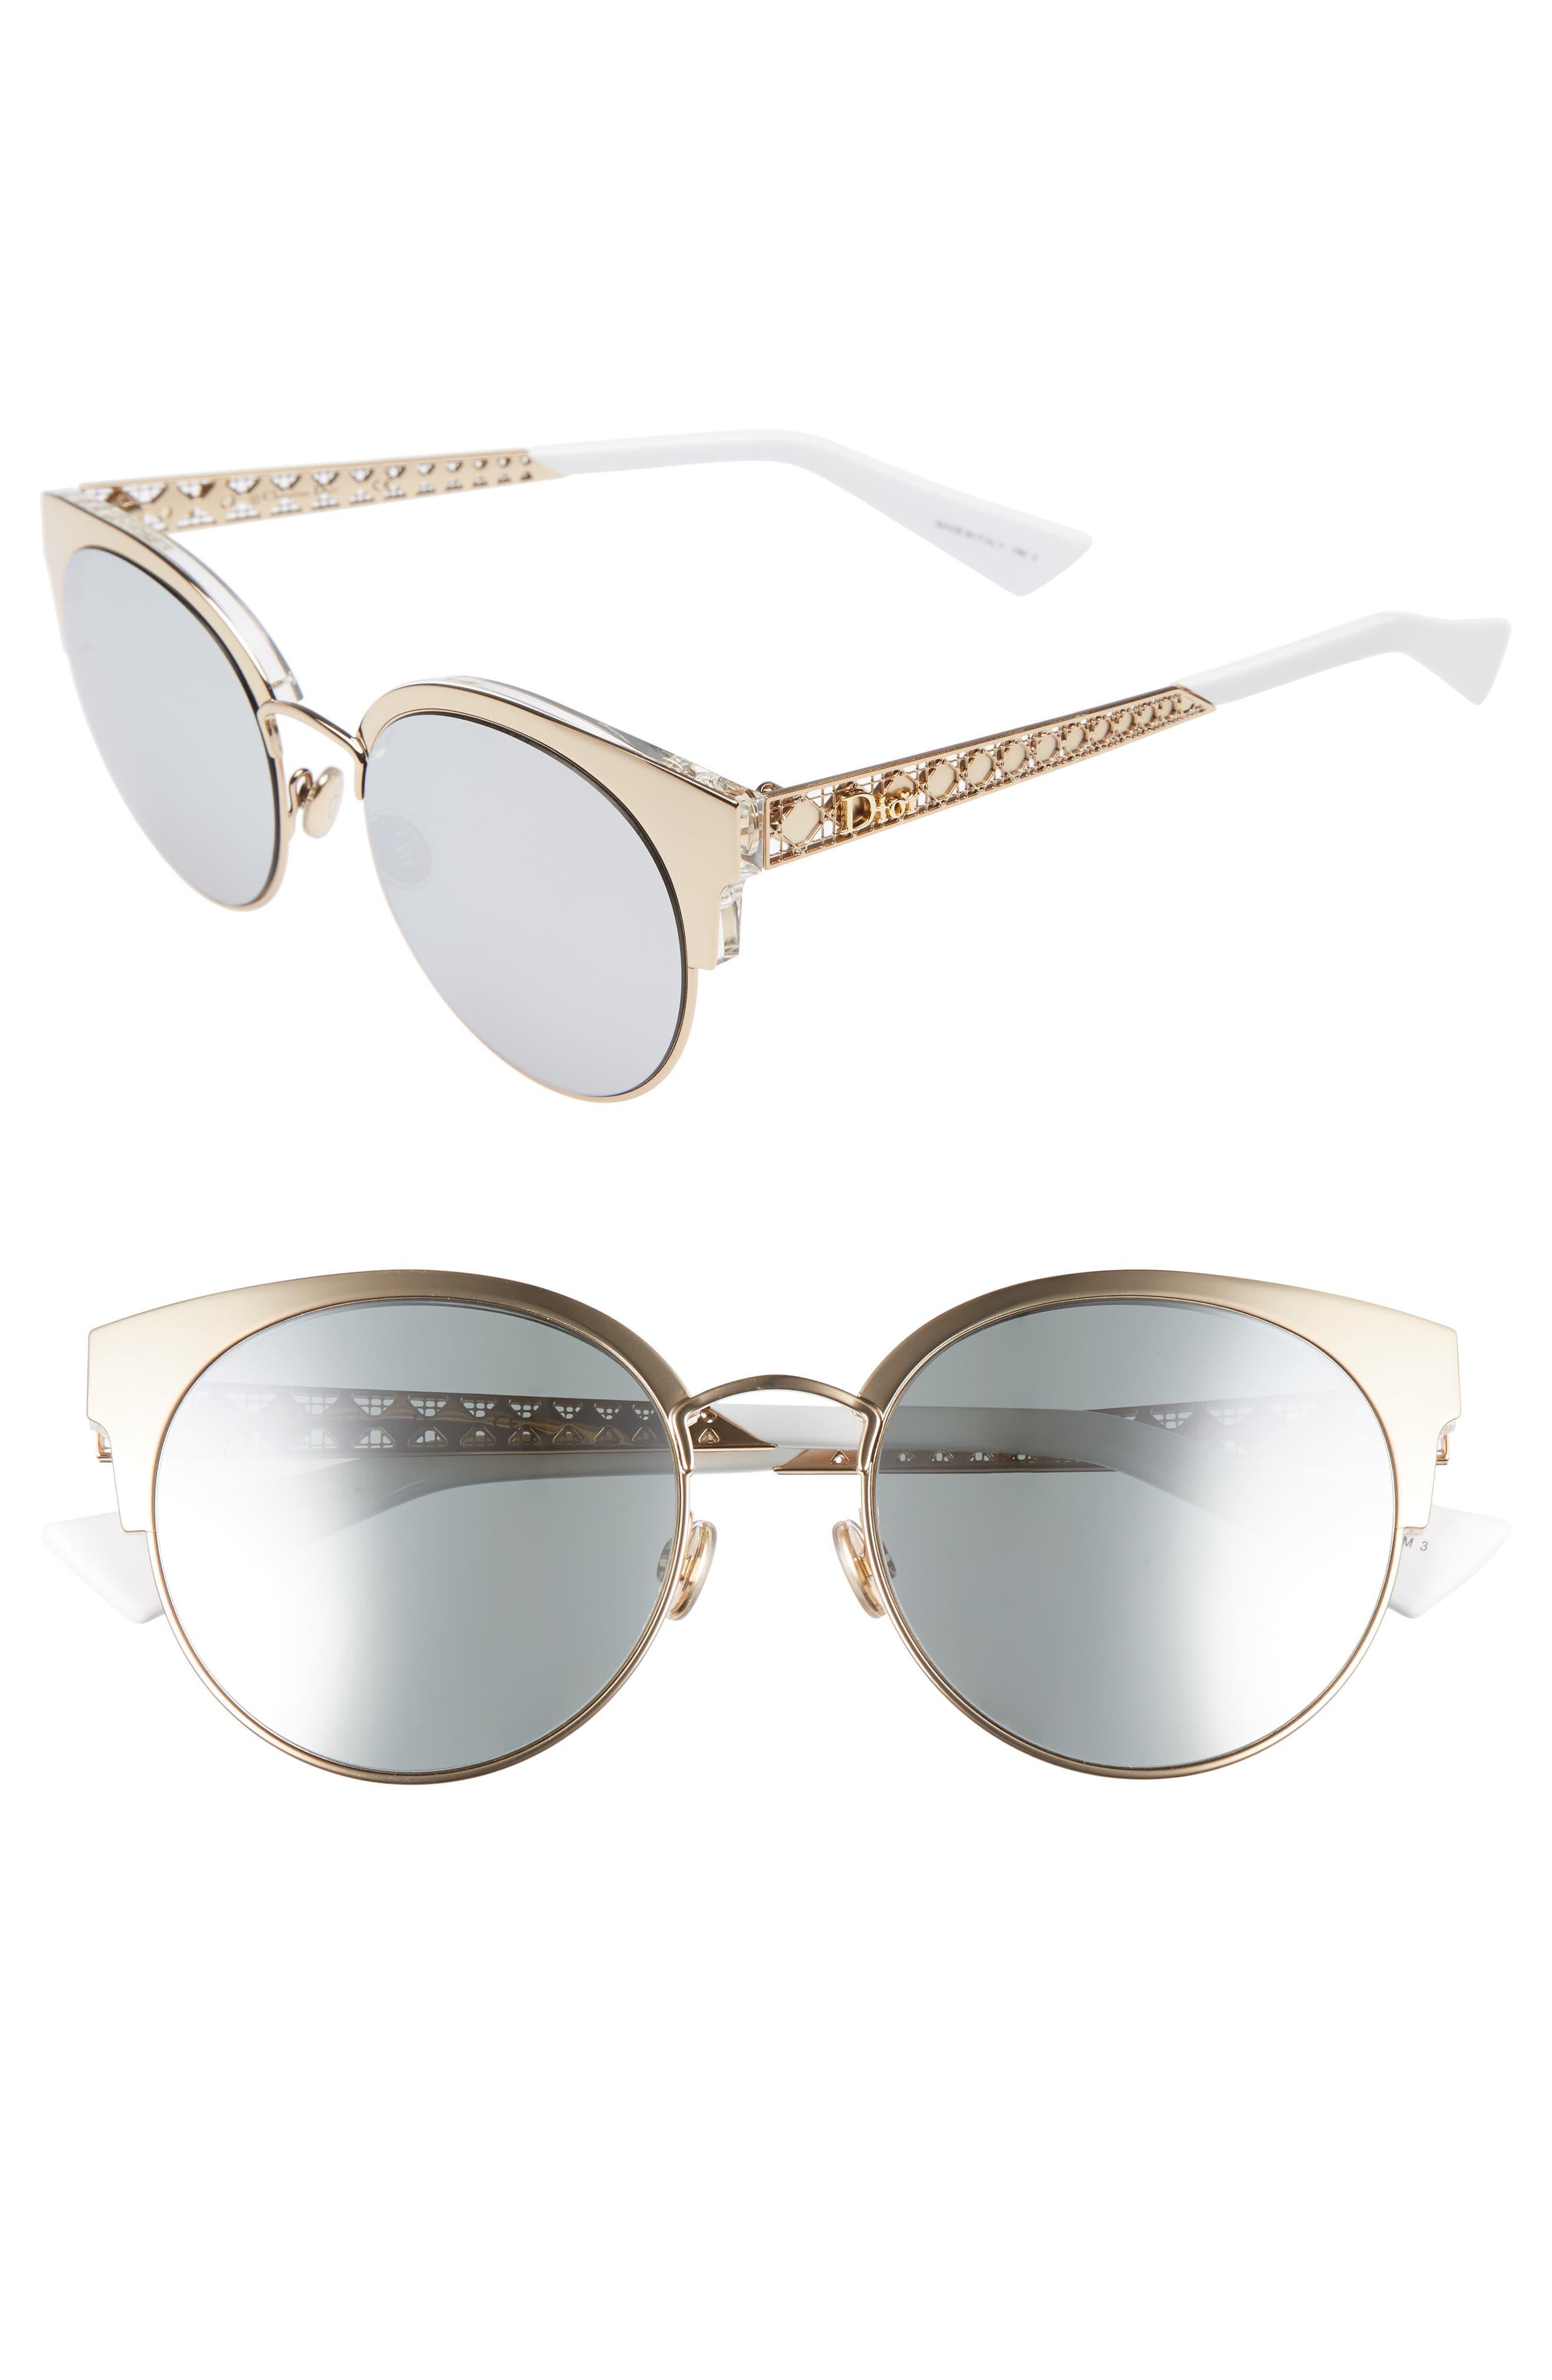 Dior Diorama Mini 54mm Mirrored Lens Cat Eye Sunglasses